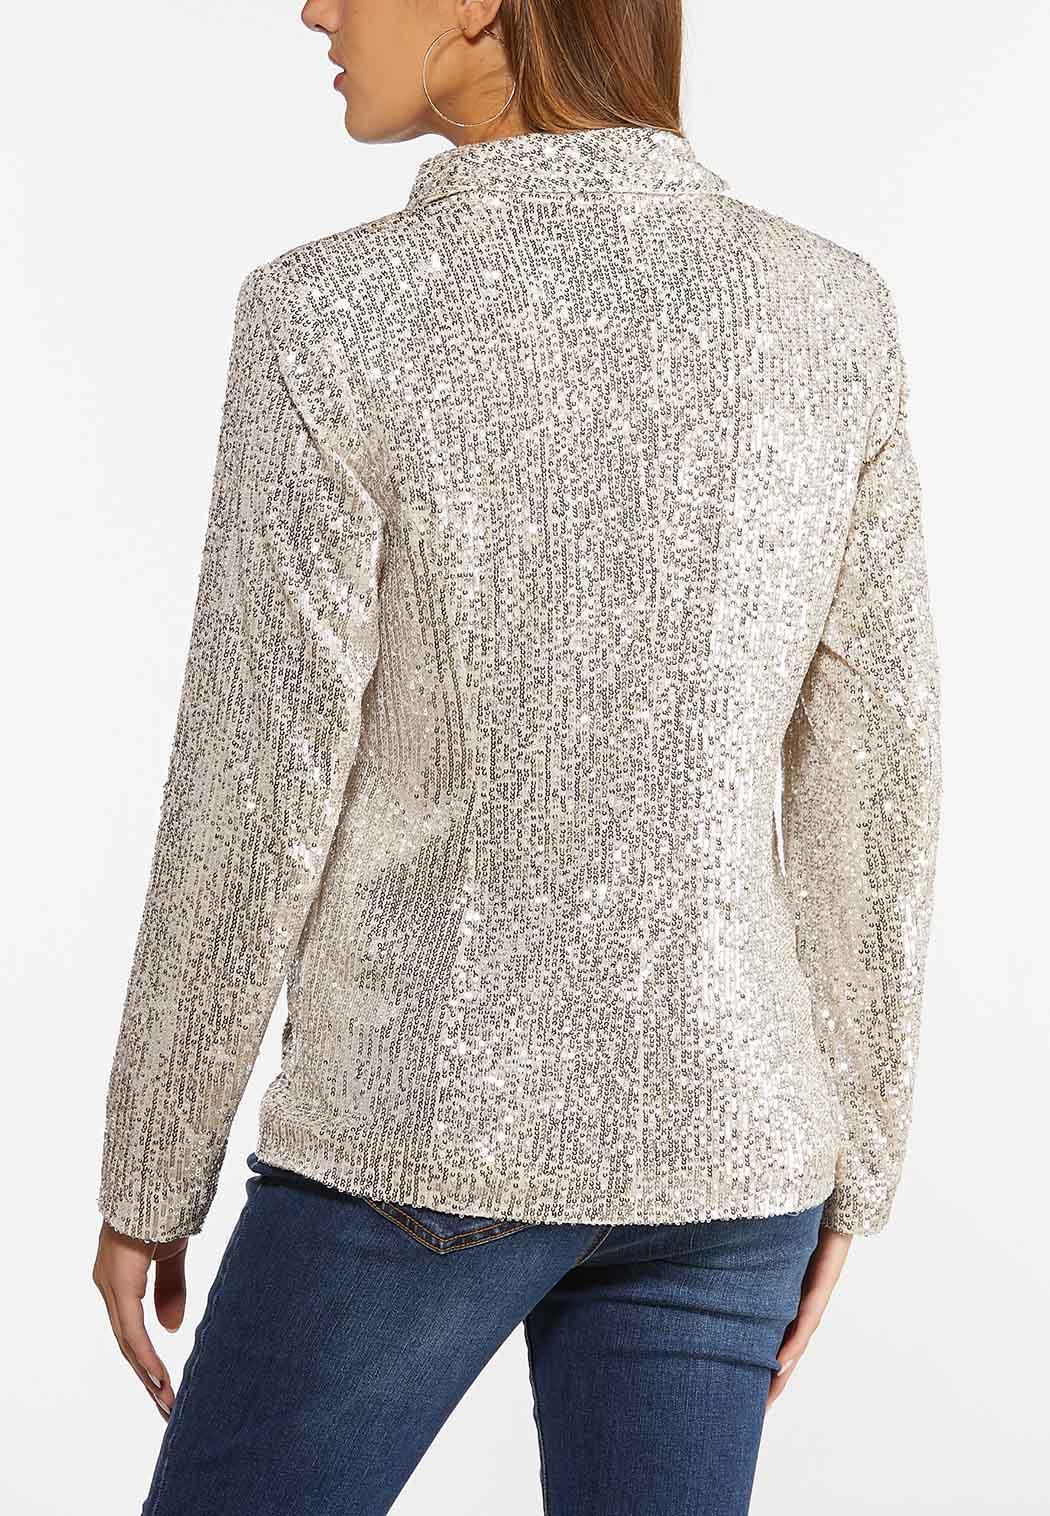 Champagne Sequin Jacket (Item #44396959)